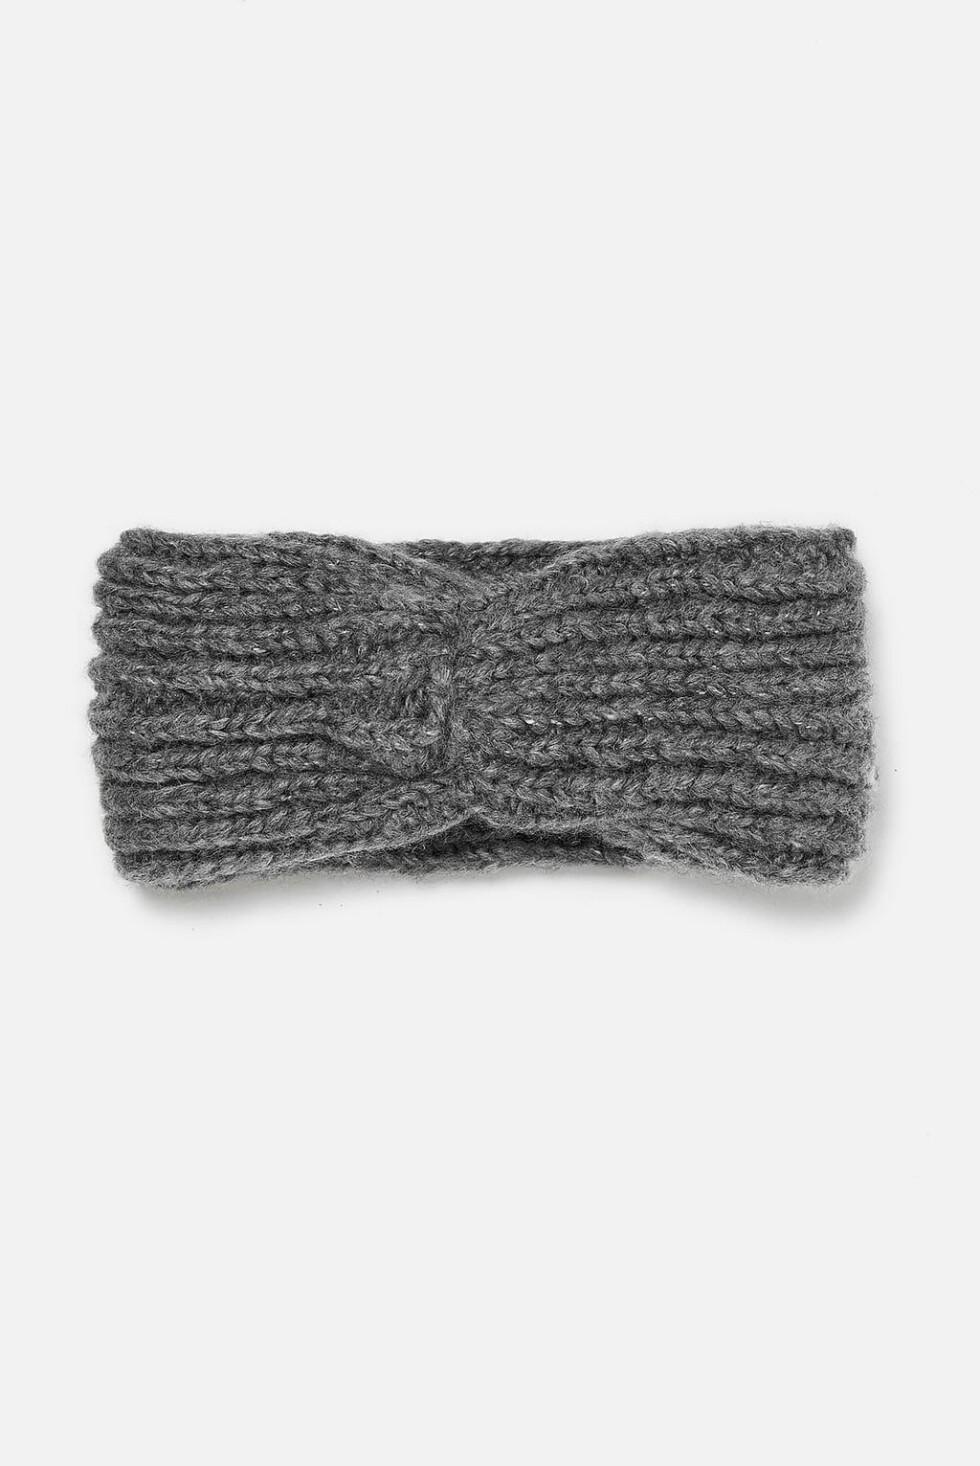 Pannebånd fra Zara |130,-| https://www.zara.com/no/no/strikket-turban-h%C3%A5rb%C3%A5nd-p06771202.html?v1=7192109&v2=1074577